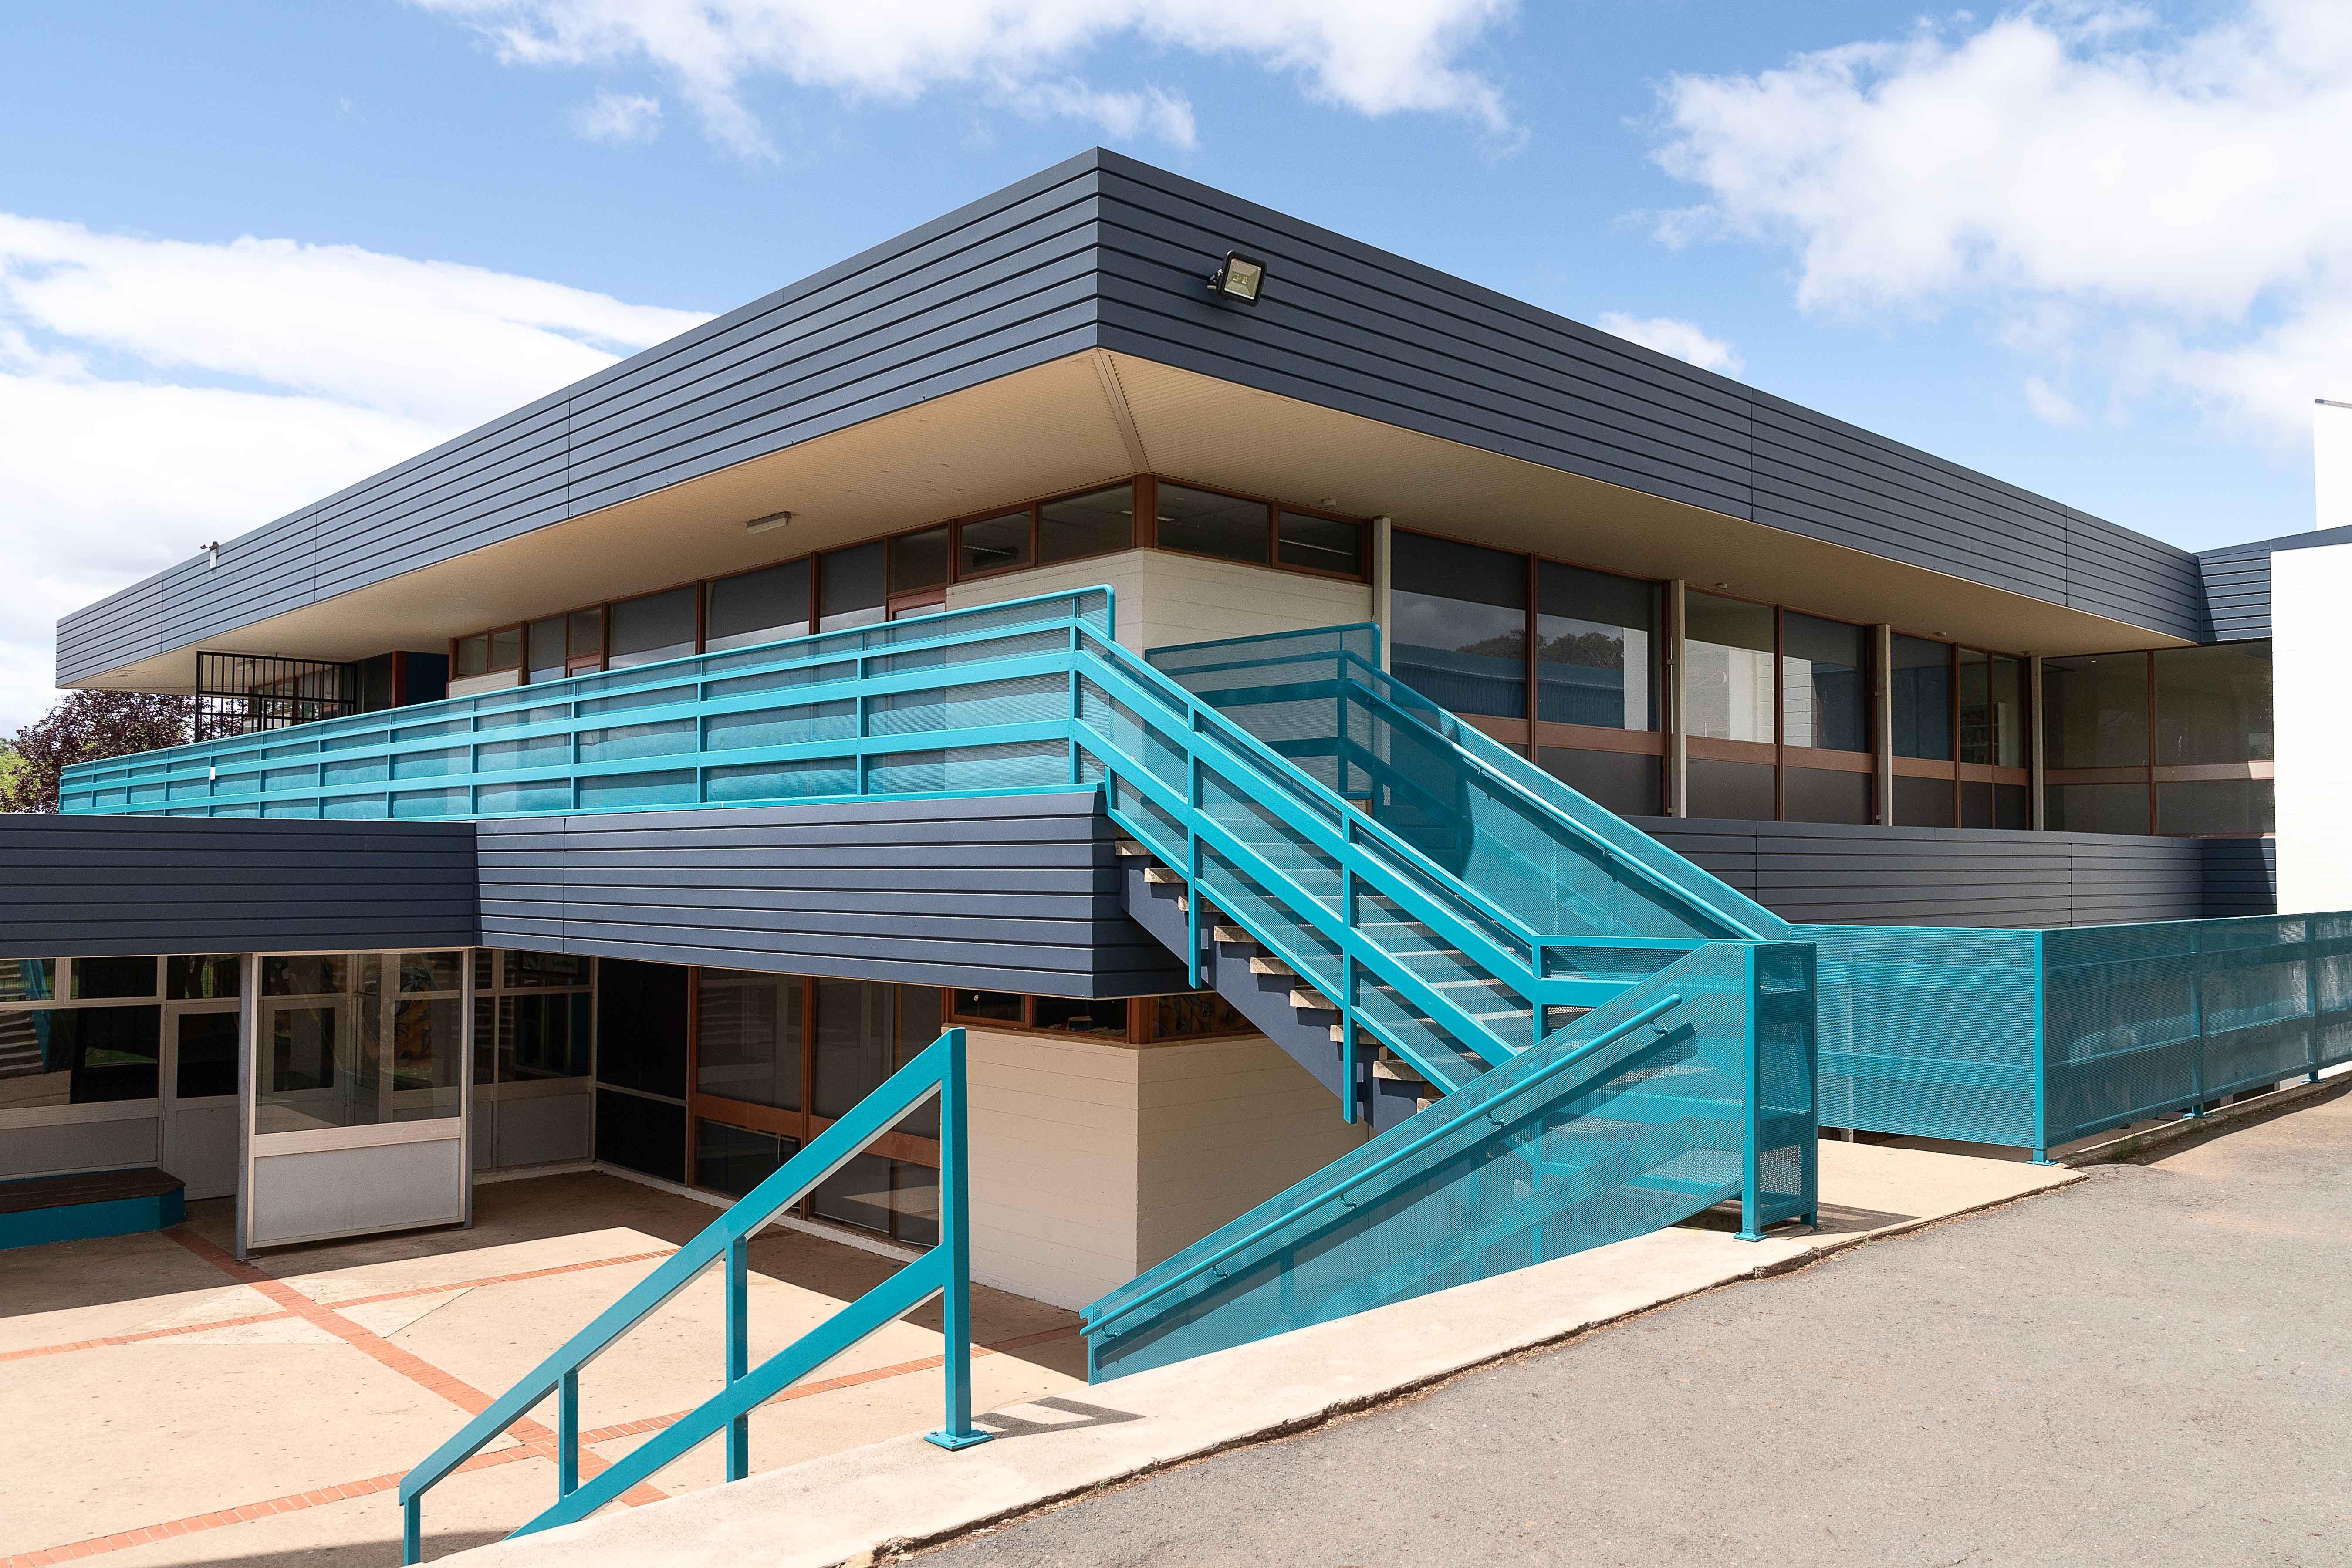 Melba Copland Secondary School